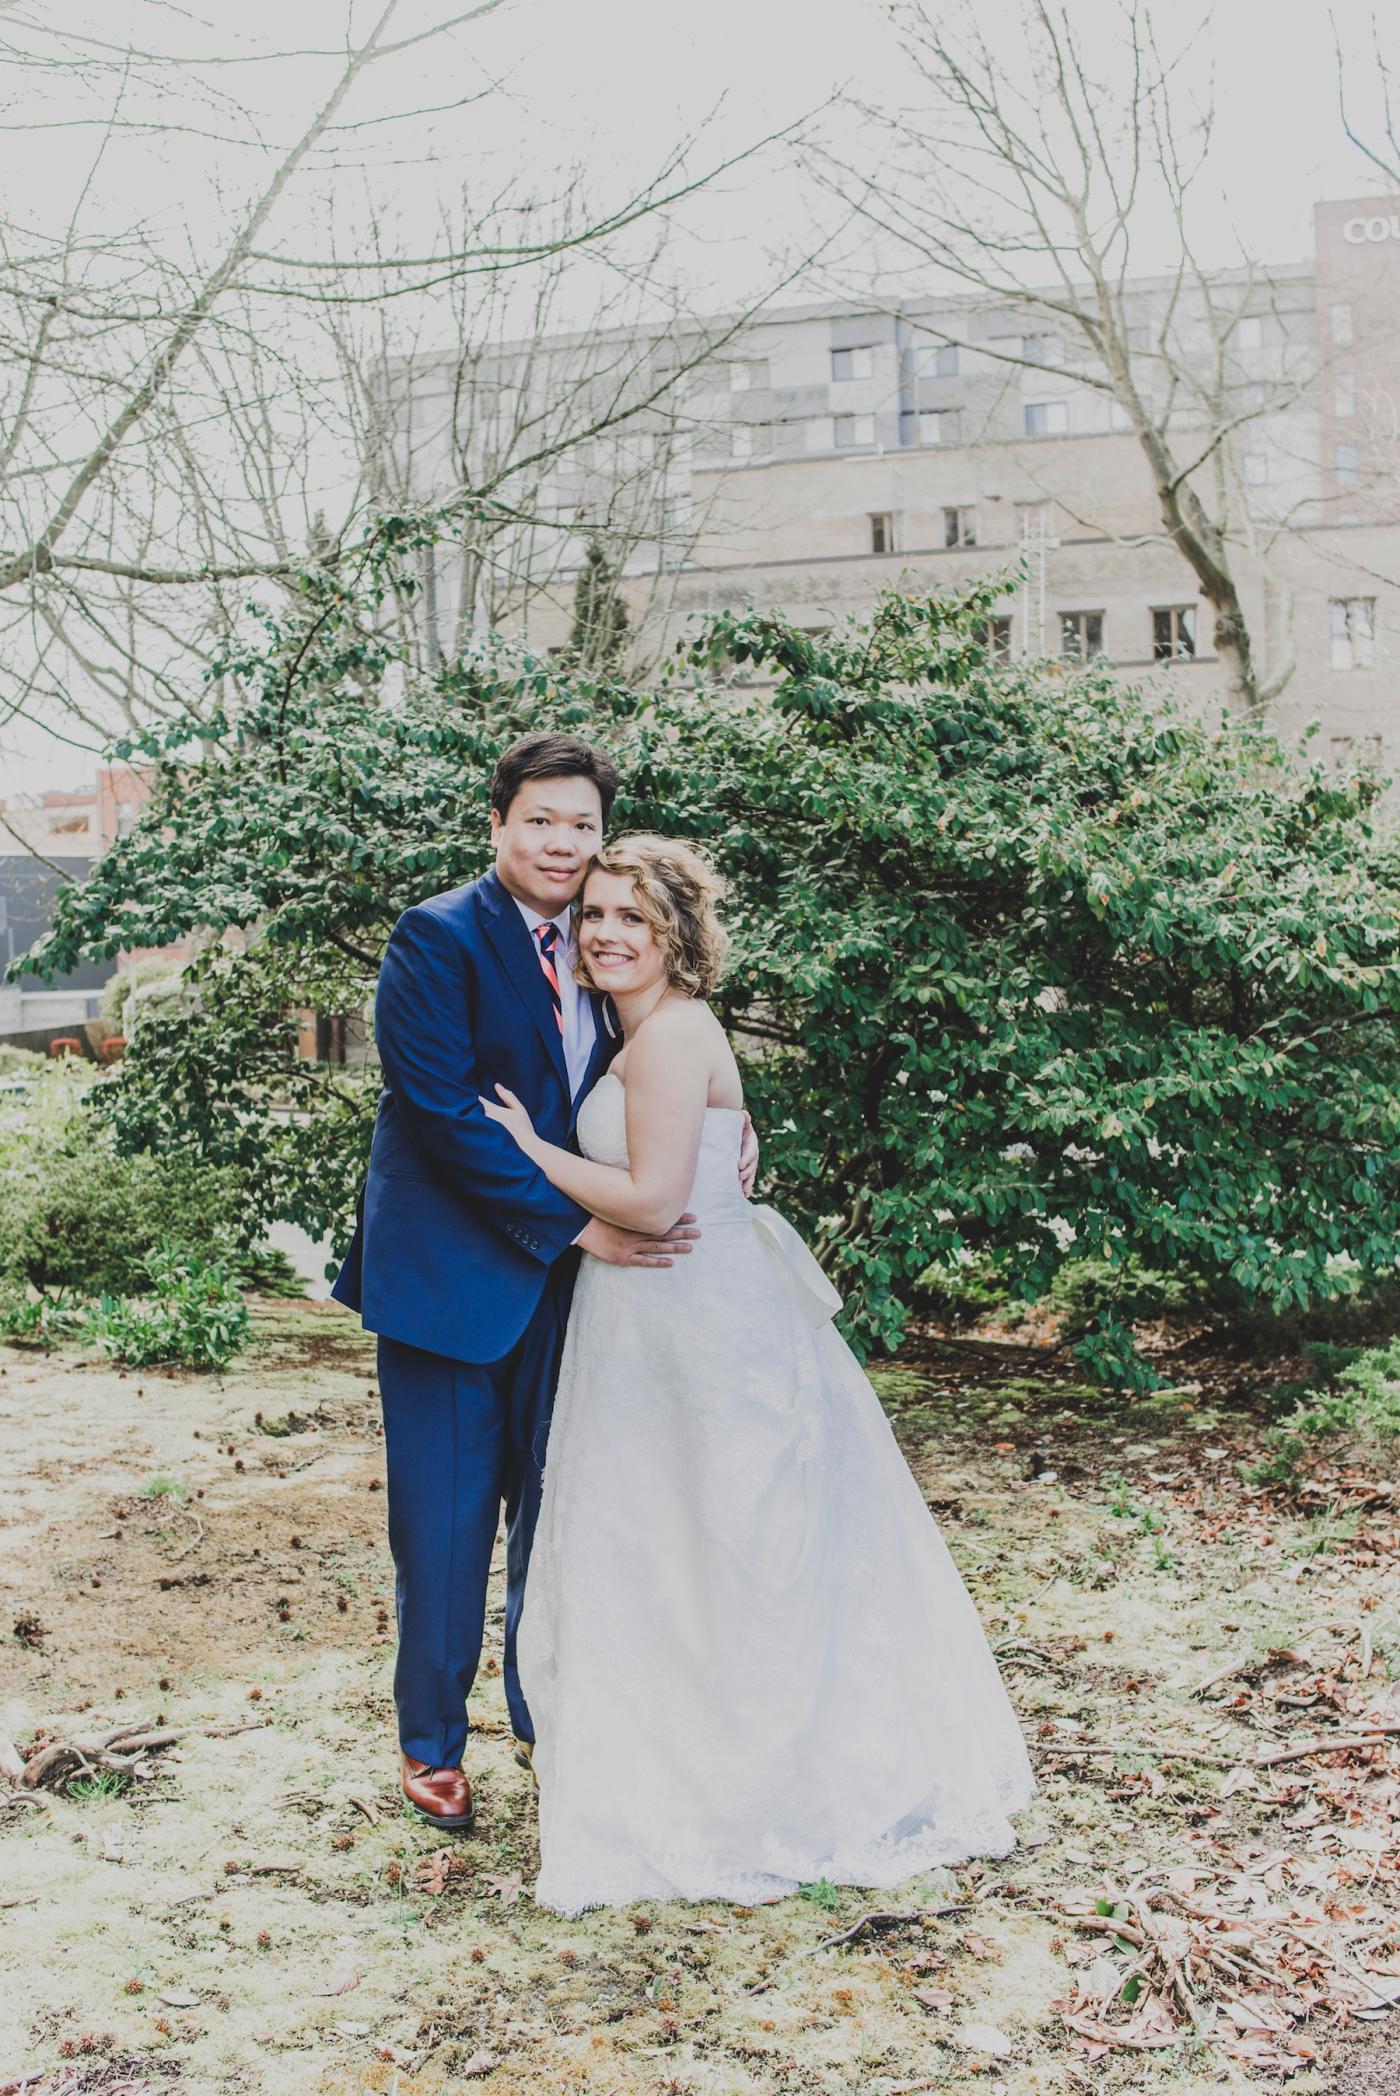 DSC_2321Everett_Wedding_Ballroom_Jane_Speleers_photography_Rachel_and_Edmund_Bridesmaids_peach_dresses_groomsmen_2017